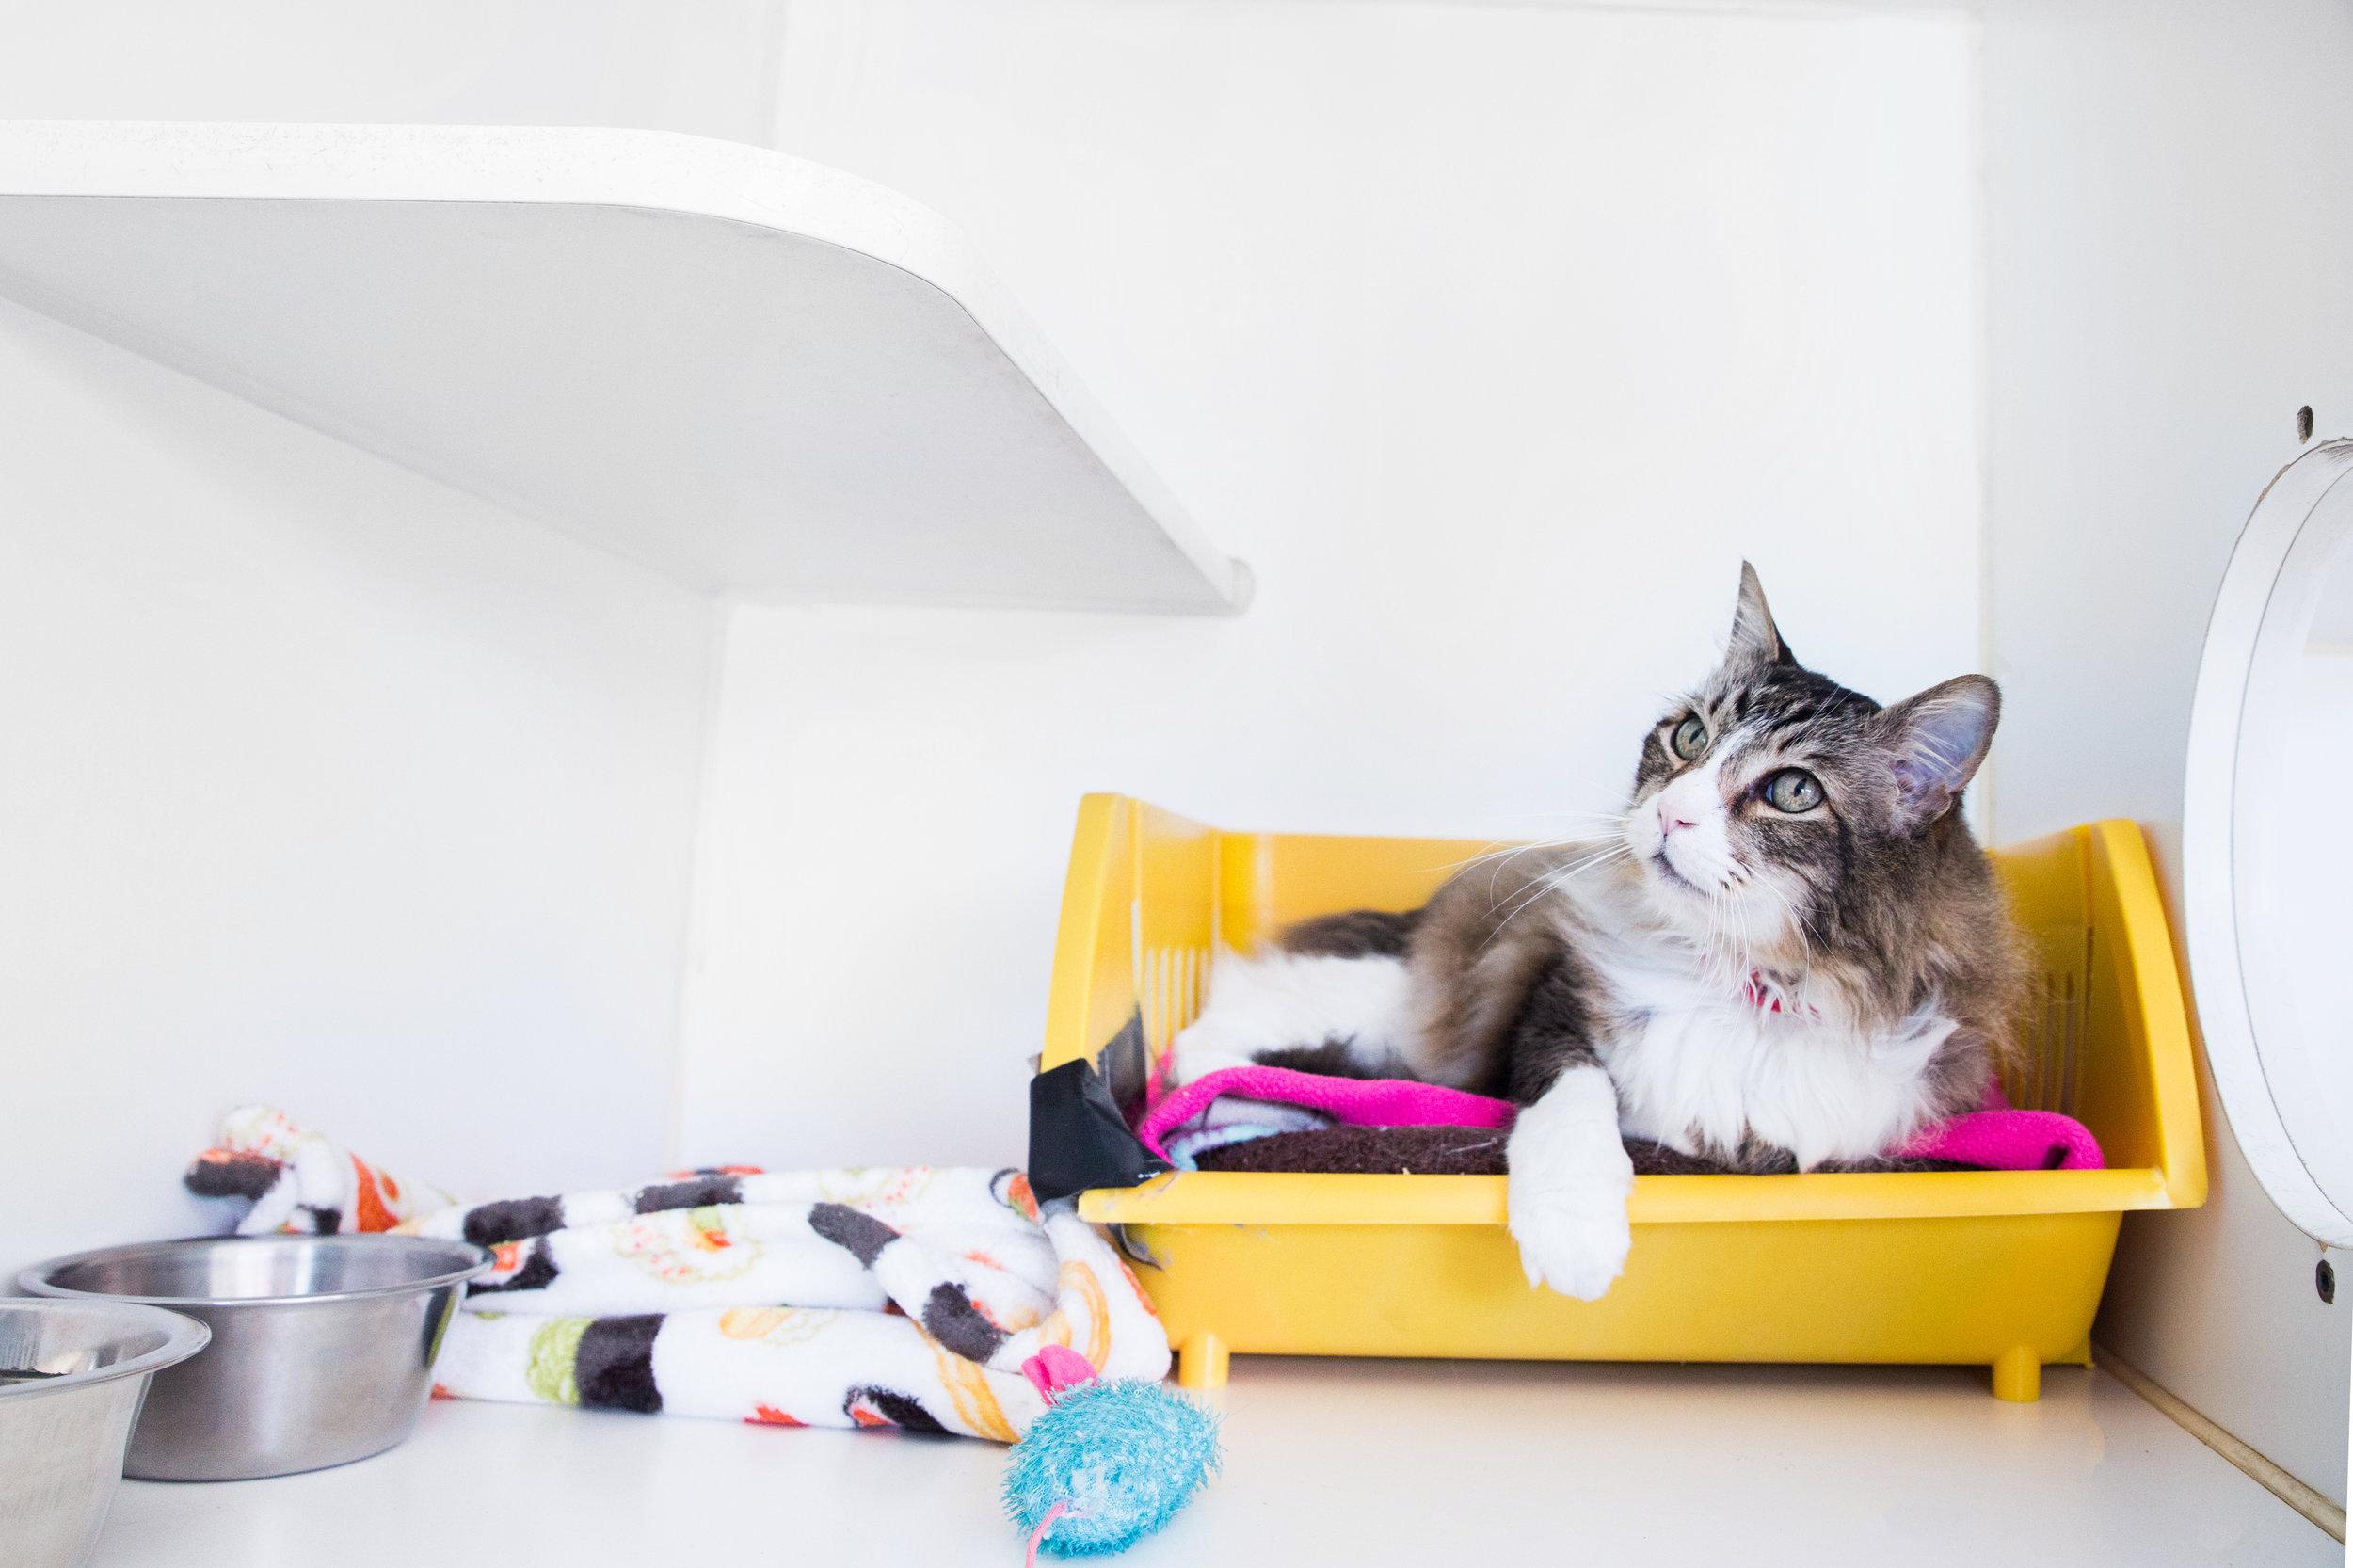 Townhouse Pet Care Cat 2.jpg